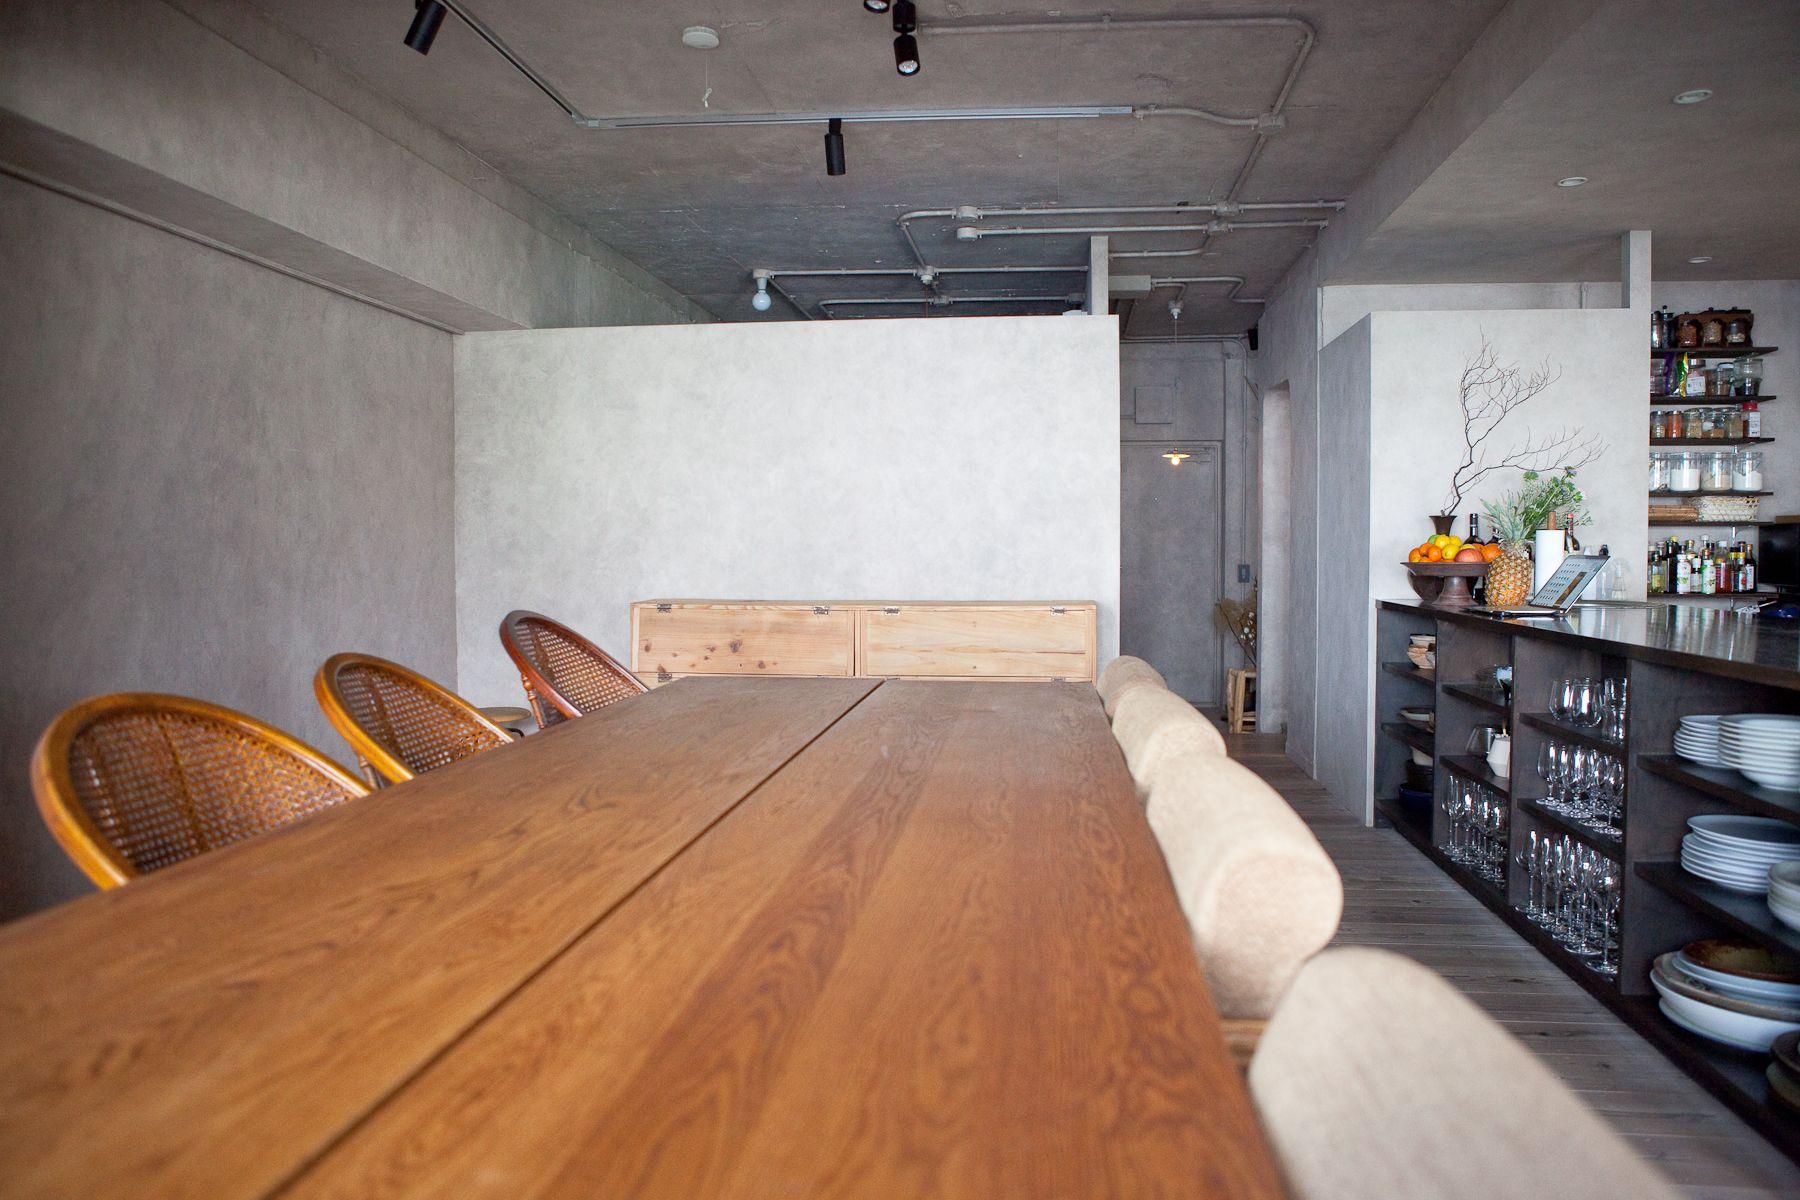 Home横浜みなとみらい(Studio Licorneマネージメントスペース)